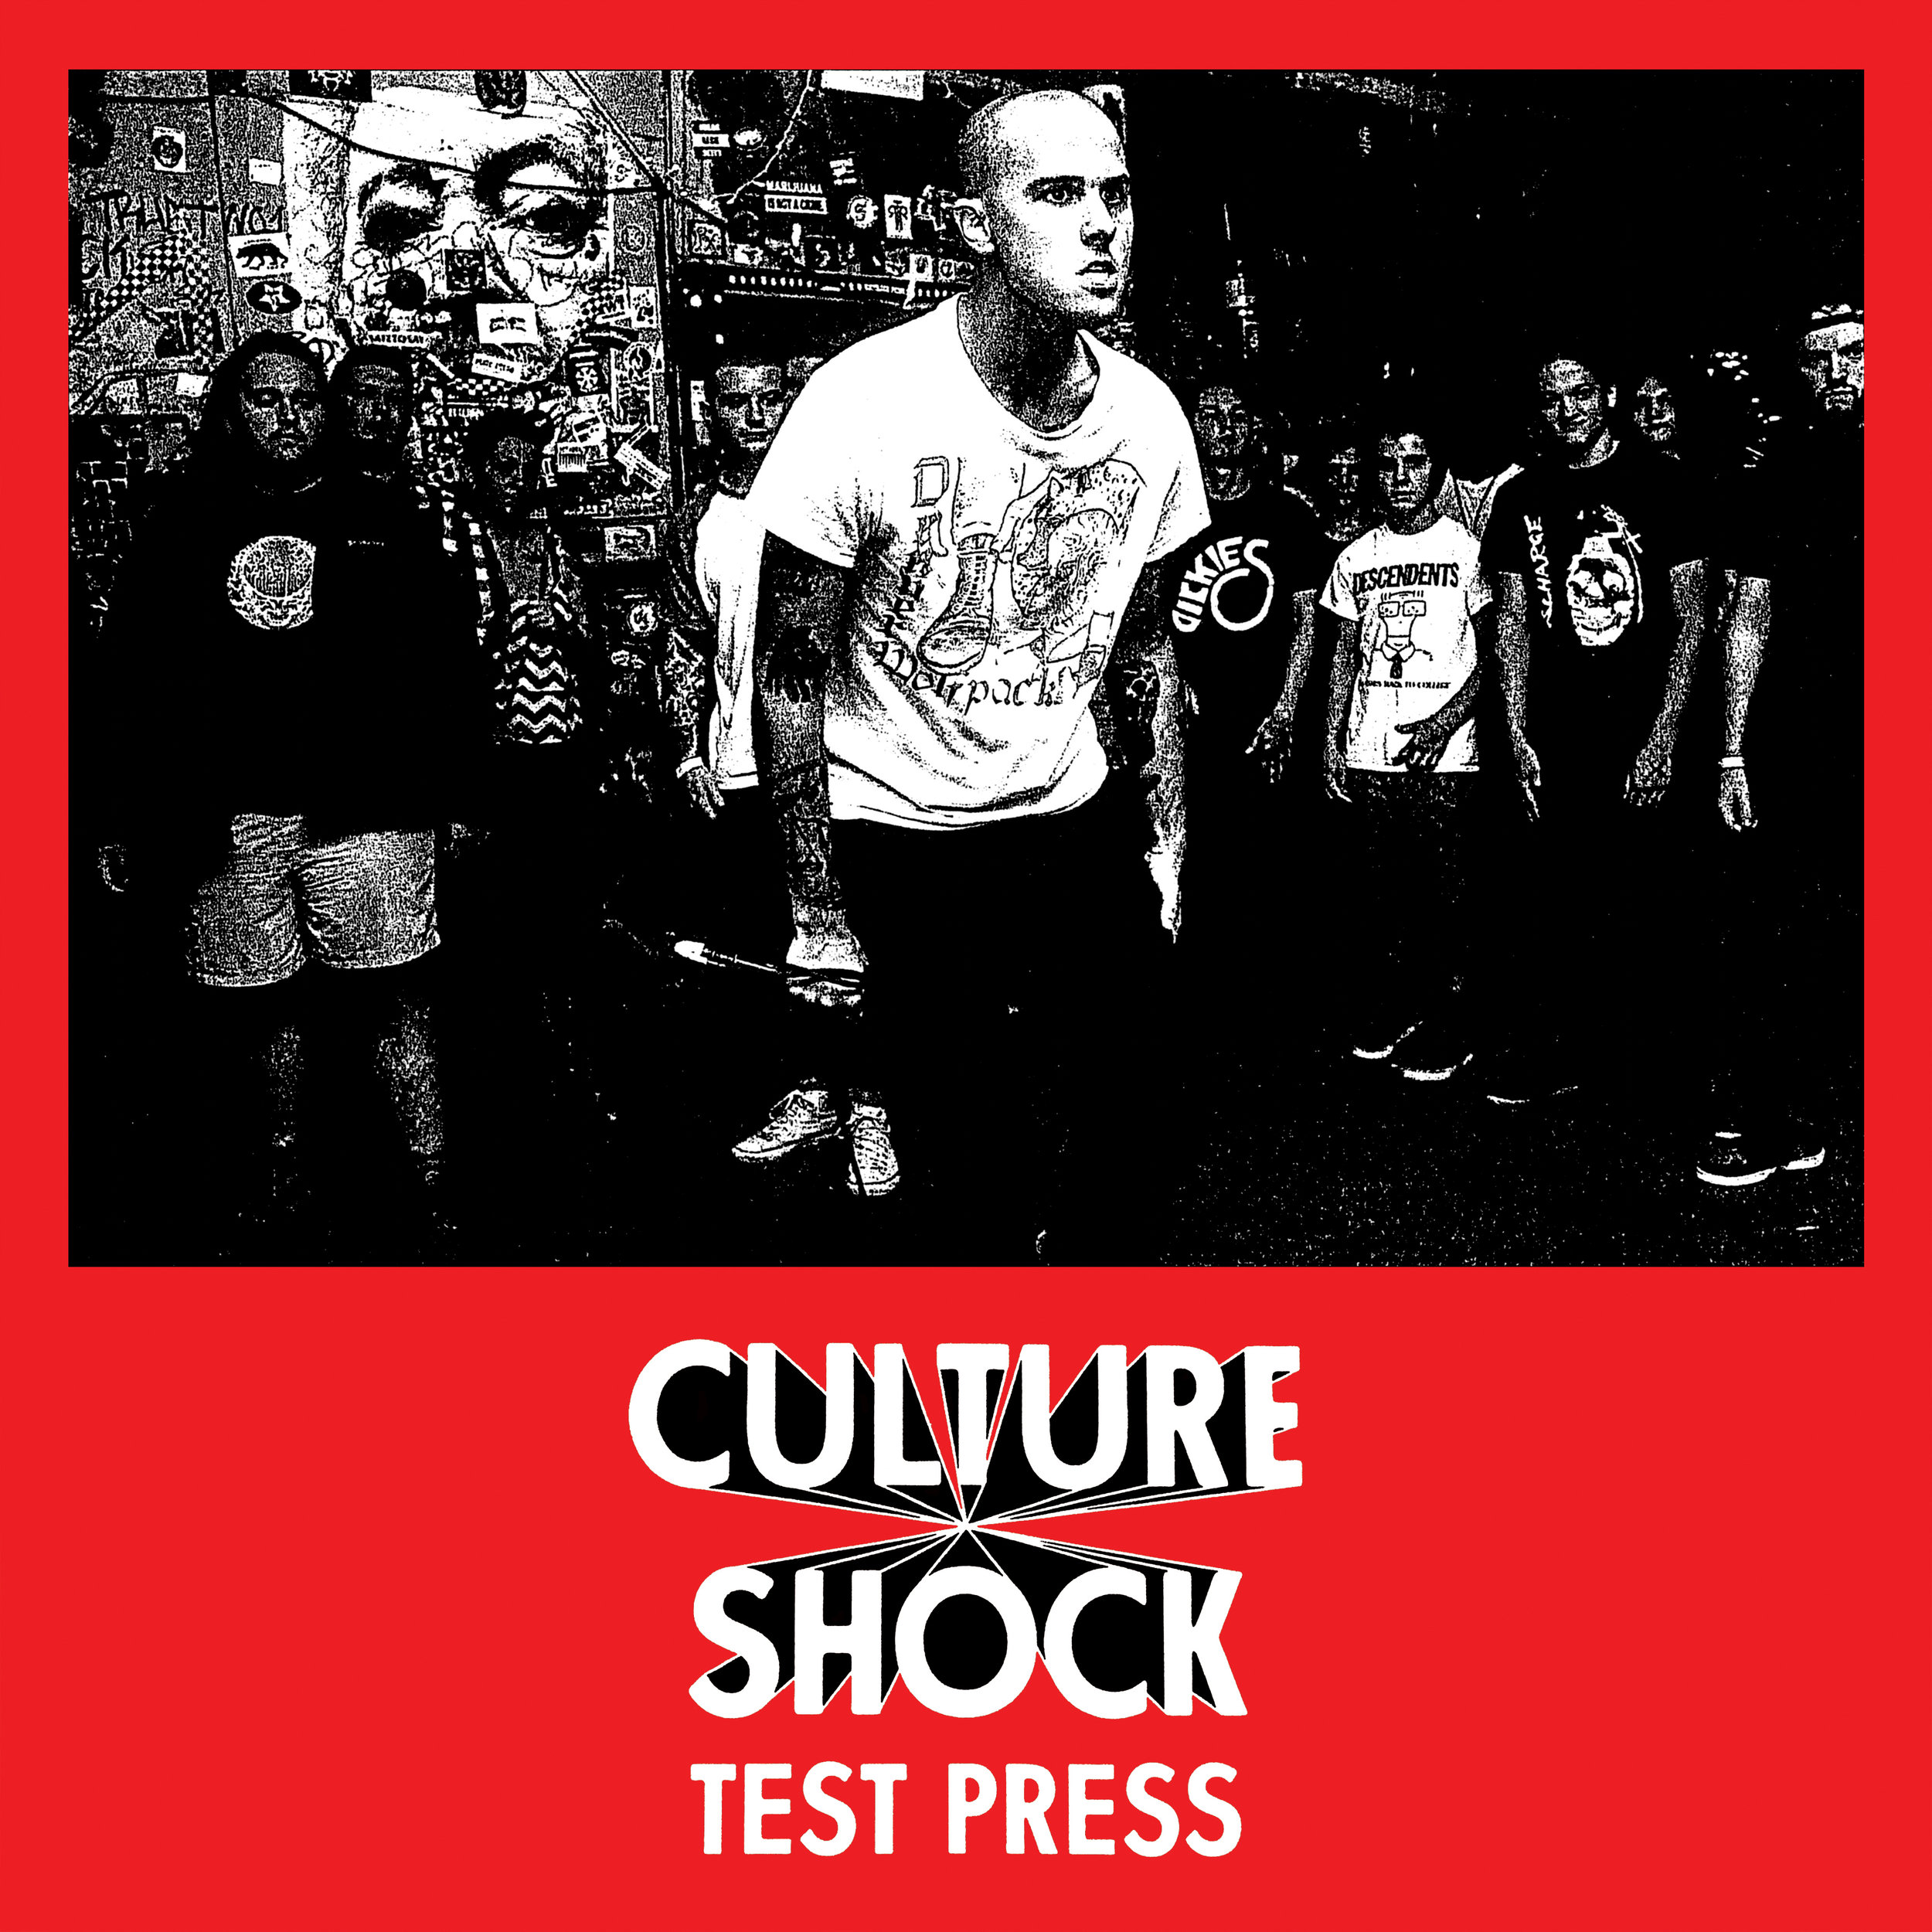 CULTURE SHOCK 2.jpg